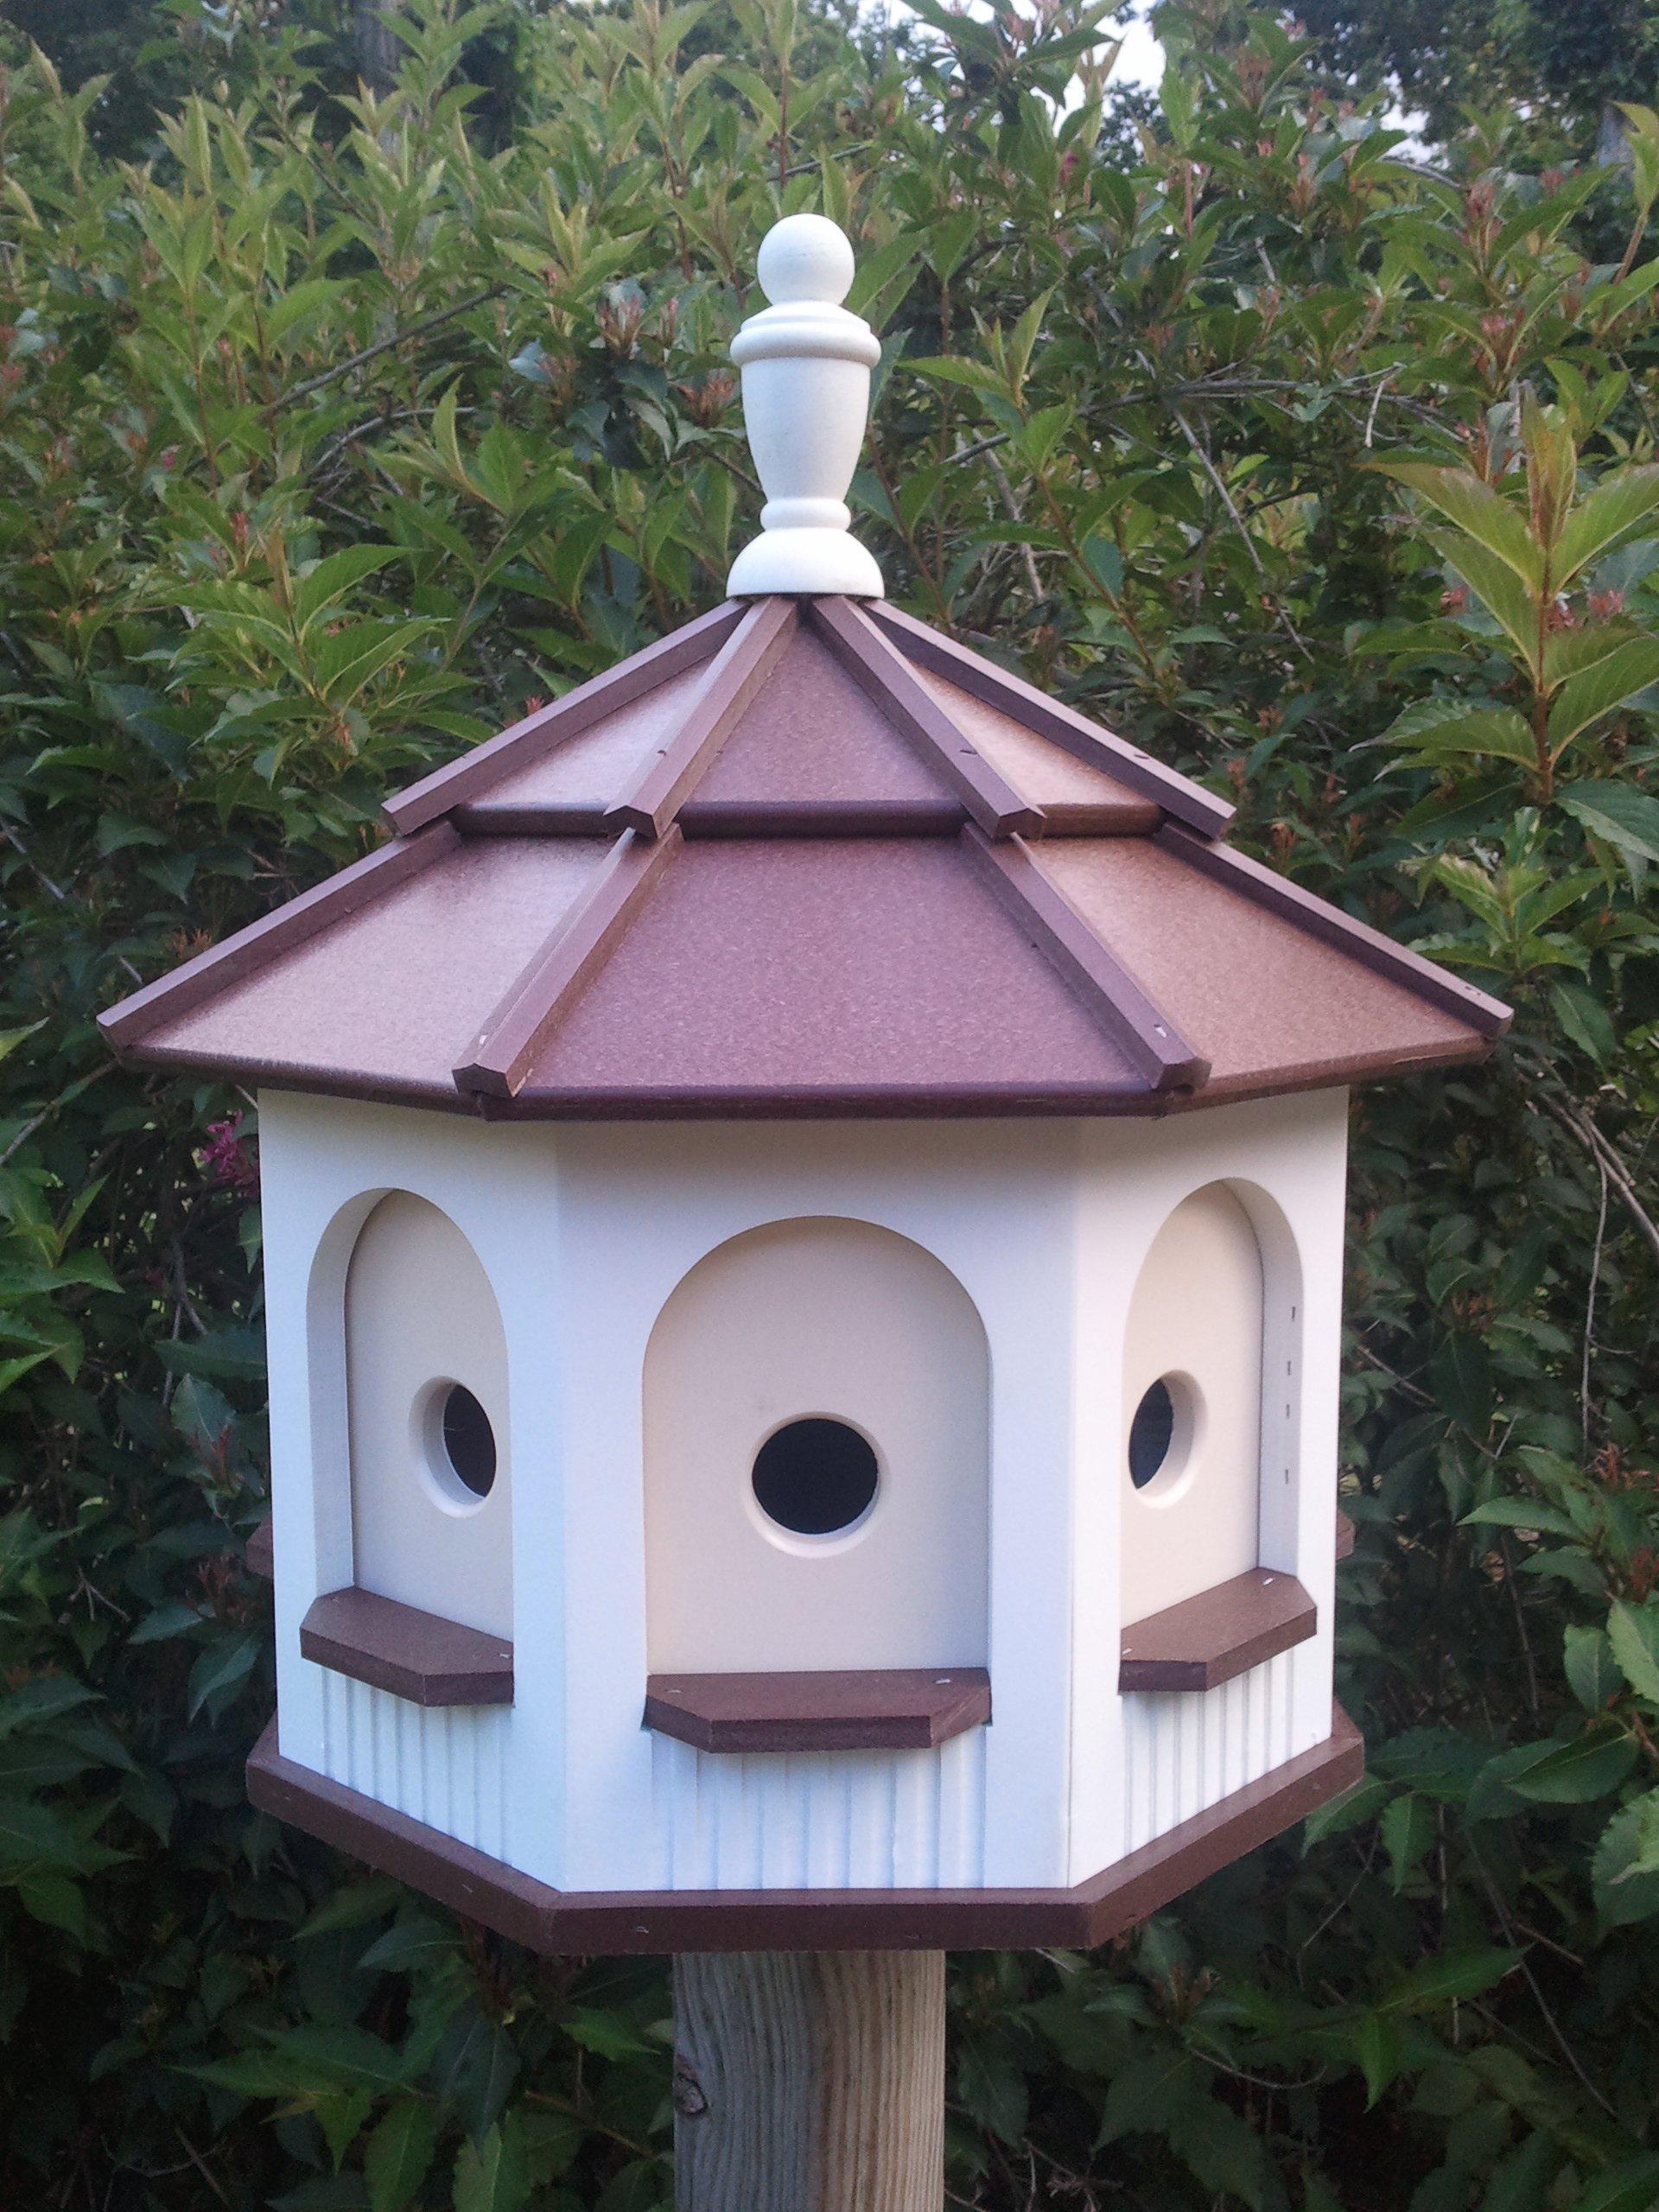 Amish homemade handcrafted Handmade Poly Gazebo Birdhouse yard White & Brown Large